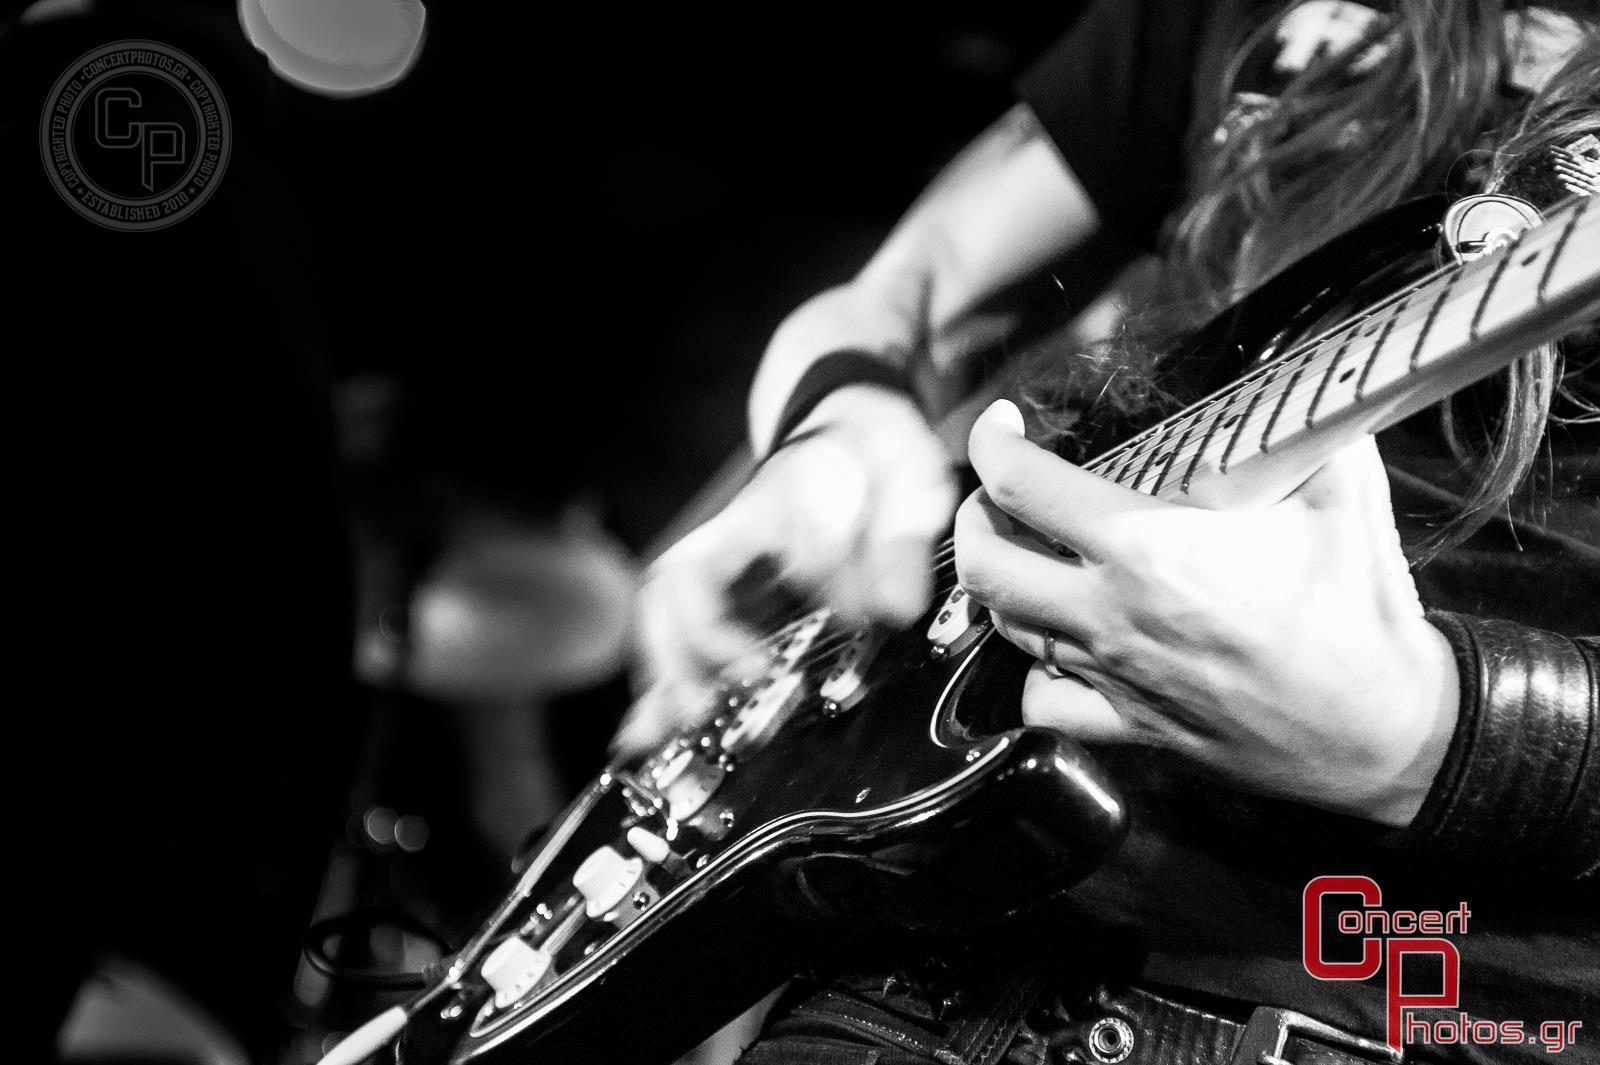 Battle Of The Bands Leg 1-Battle Of The Bands Leg 1 photographer:  - ConcertPhotos - 20141127_0022_34